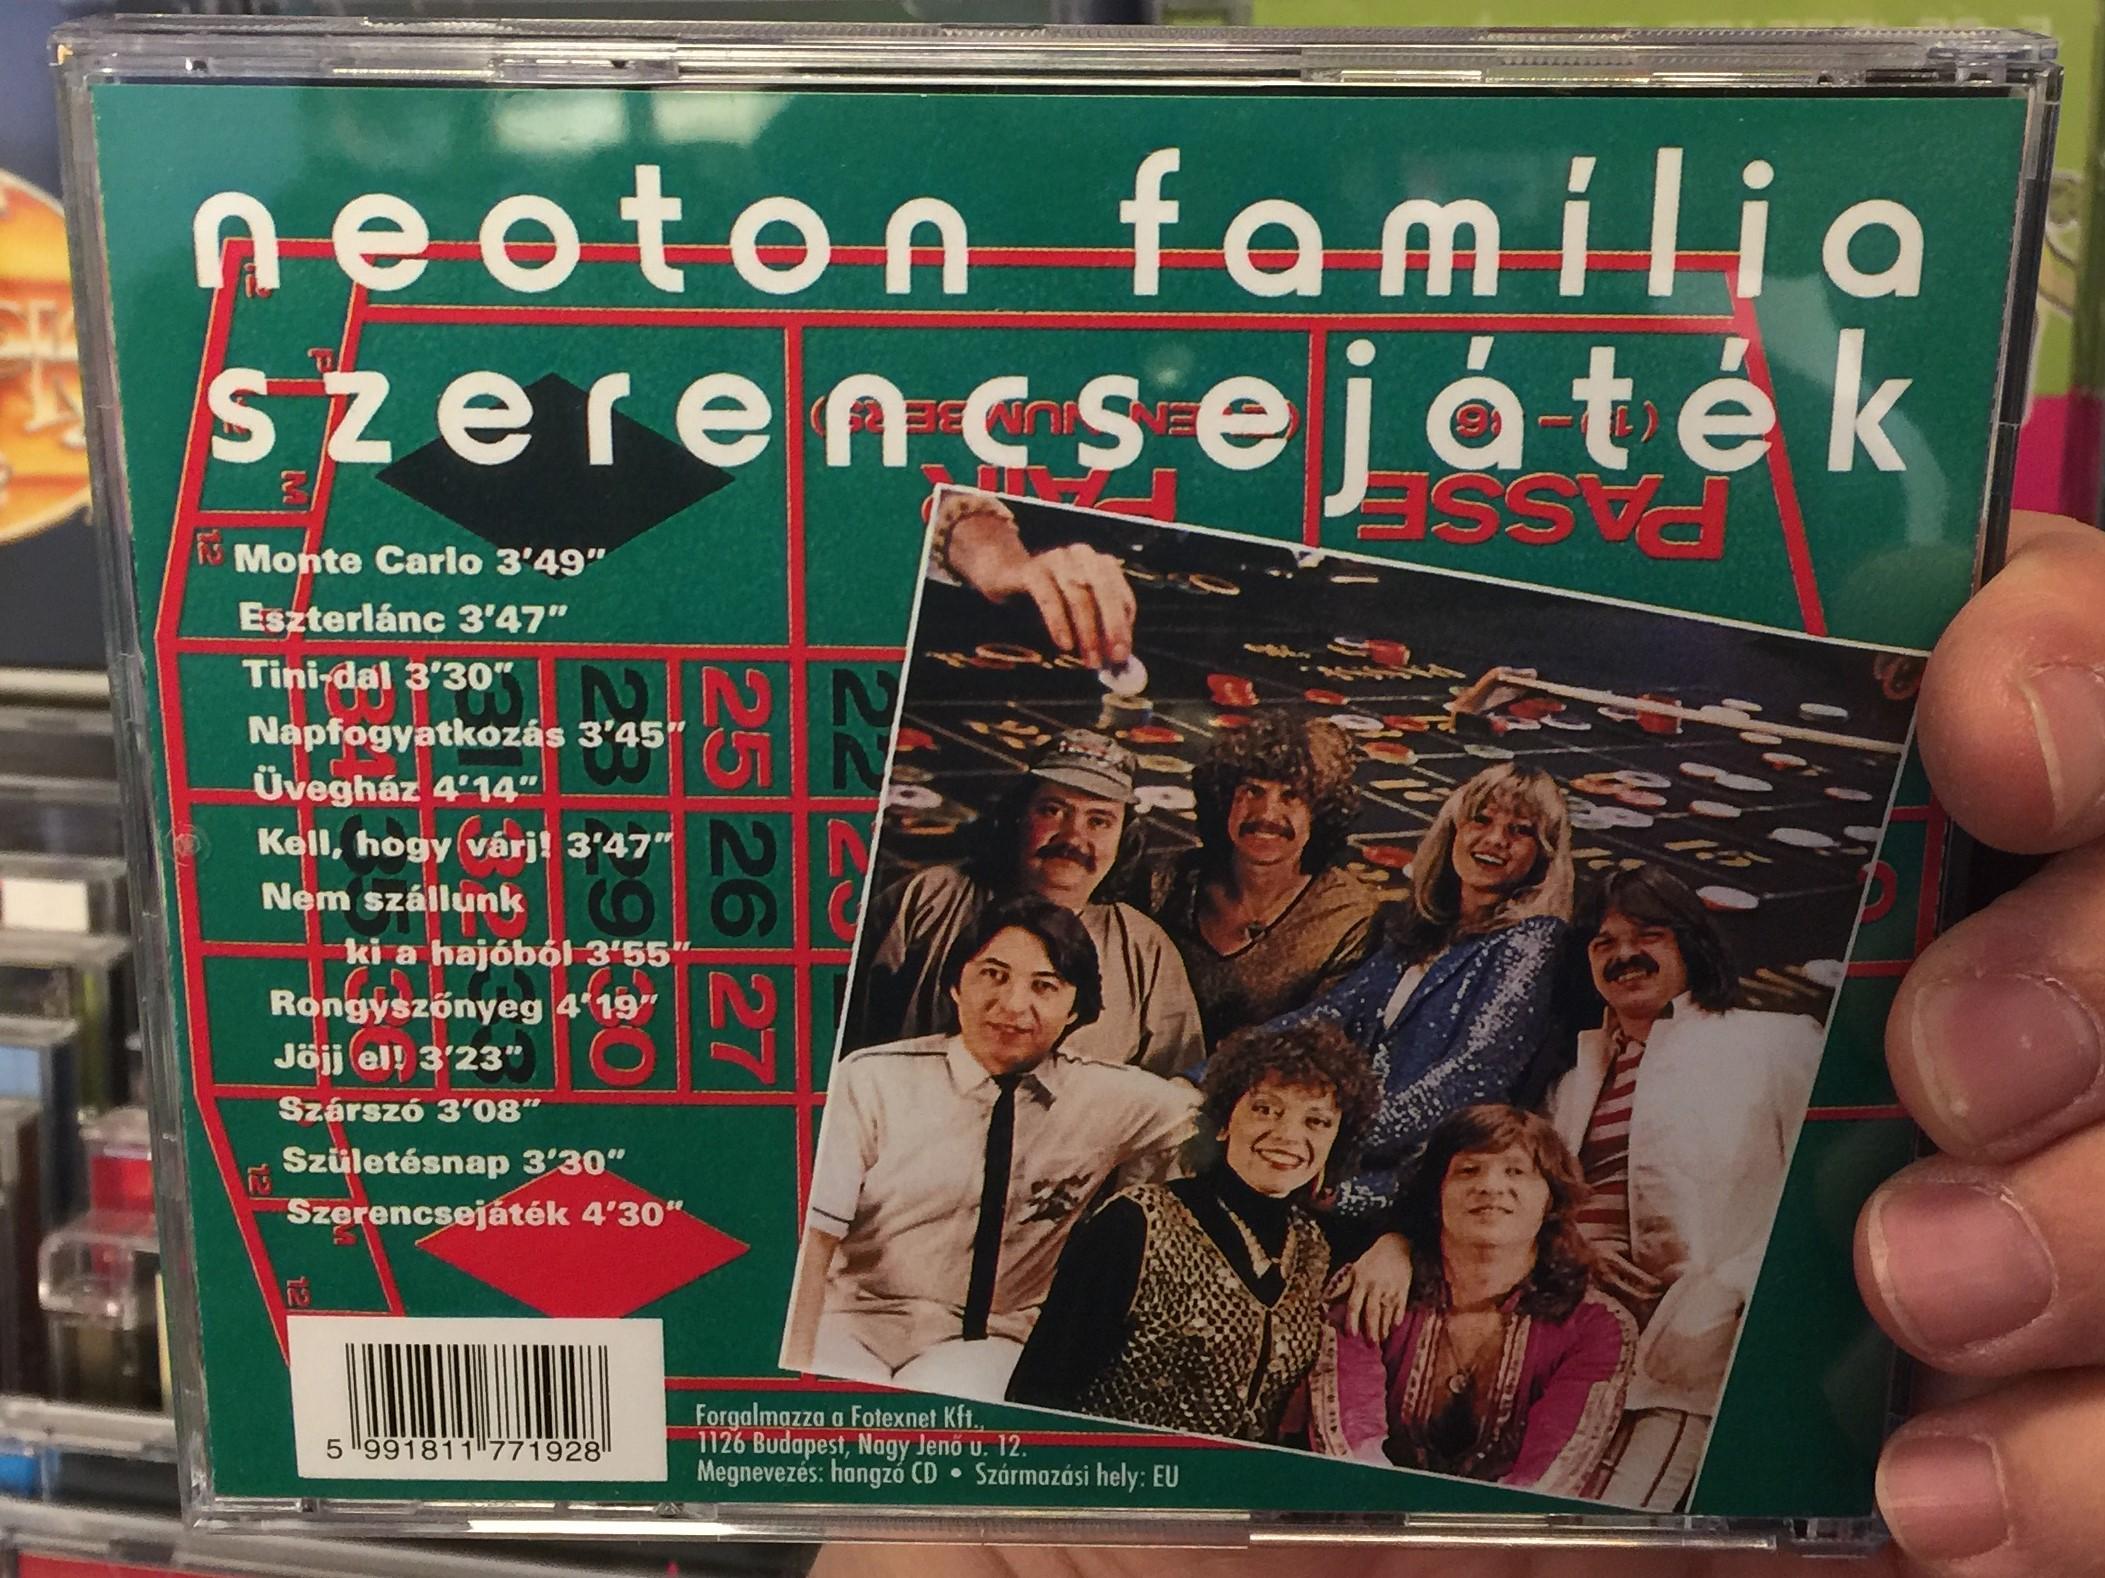 szerencsej-t-k-neoton-fam-lia-hungaroton-audio-cd-hcd-17719-2-.jpg